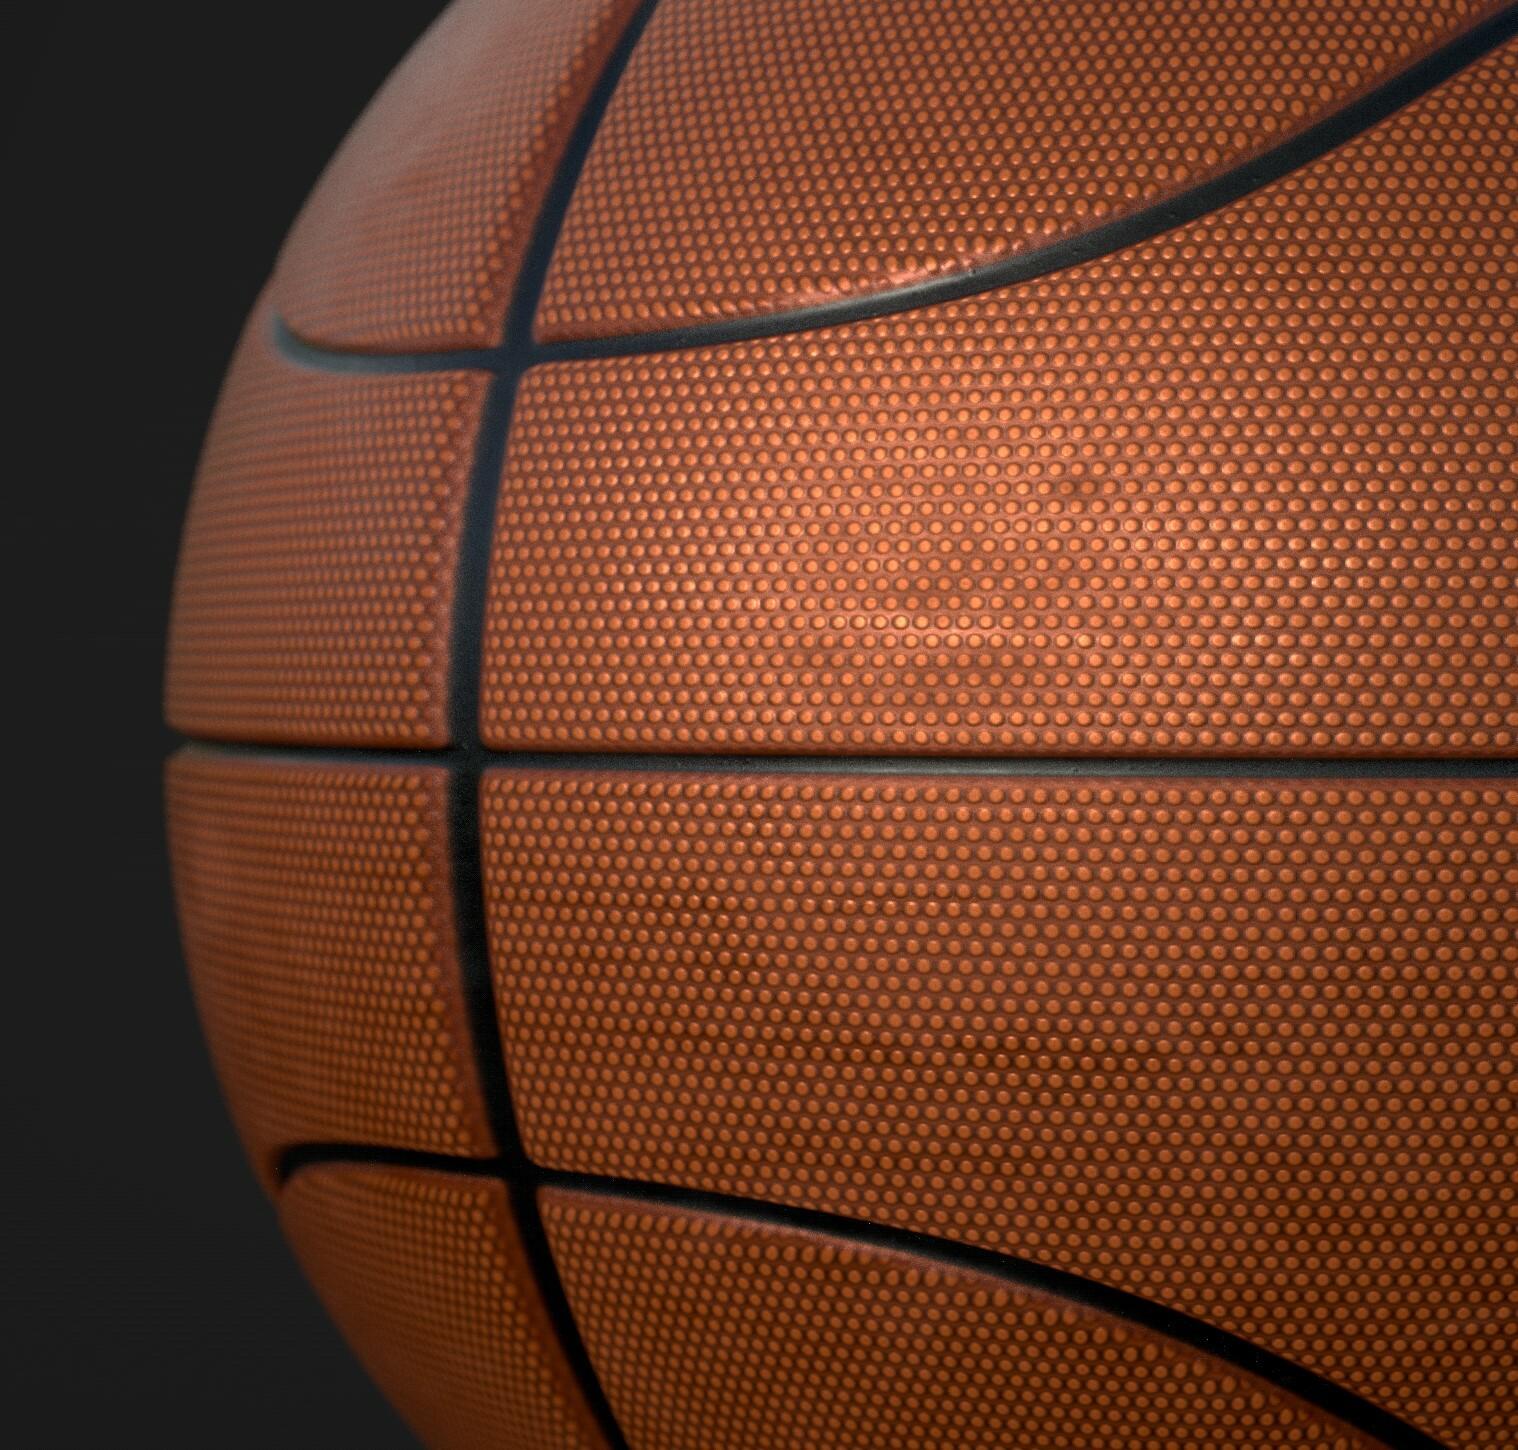 Marcelo souza basketball 01 05 c